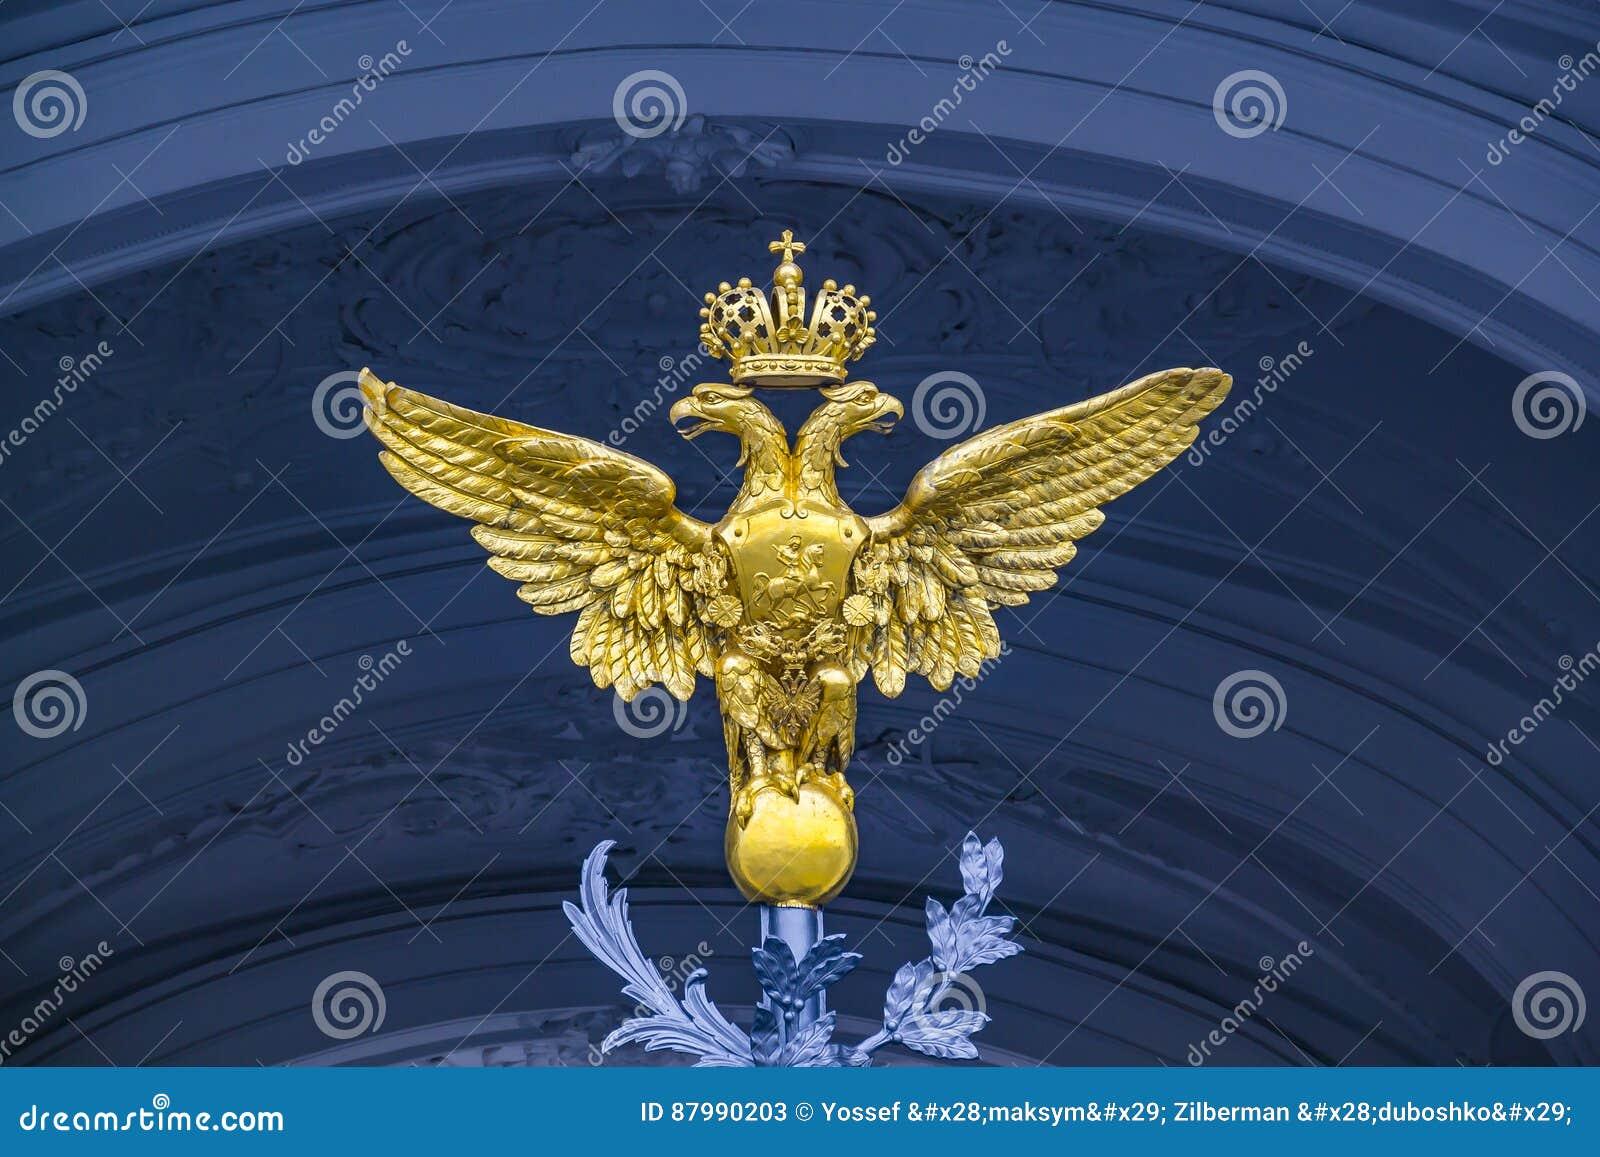 Dubbla Eagle - emblem av Ryssland på portvinterslotten i St Petersburg